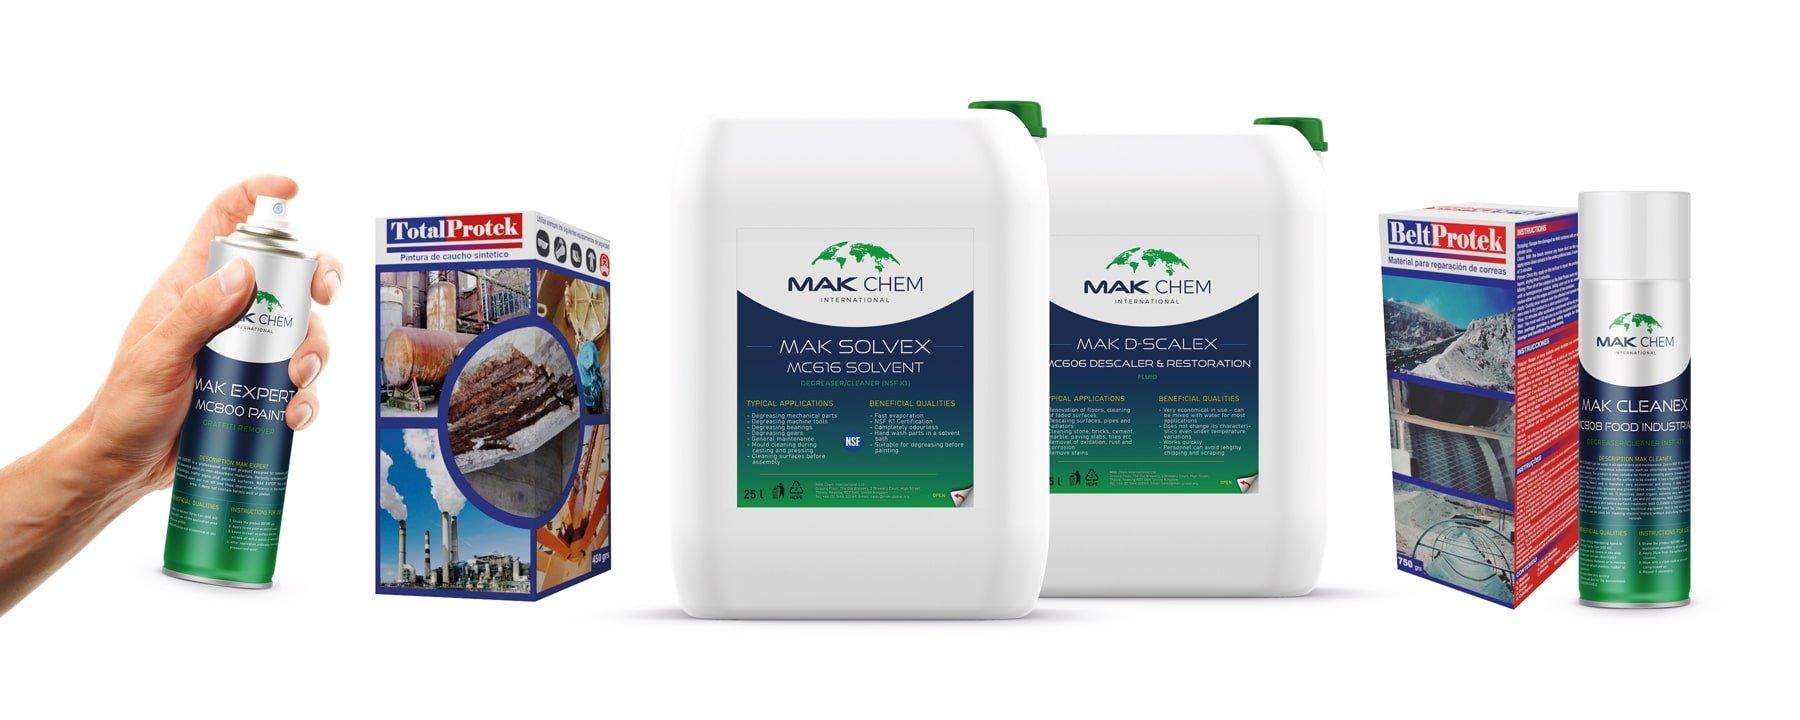 mak-chem-product-range-selection-min